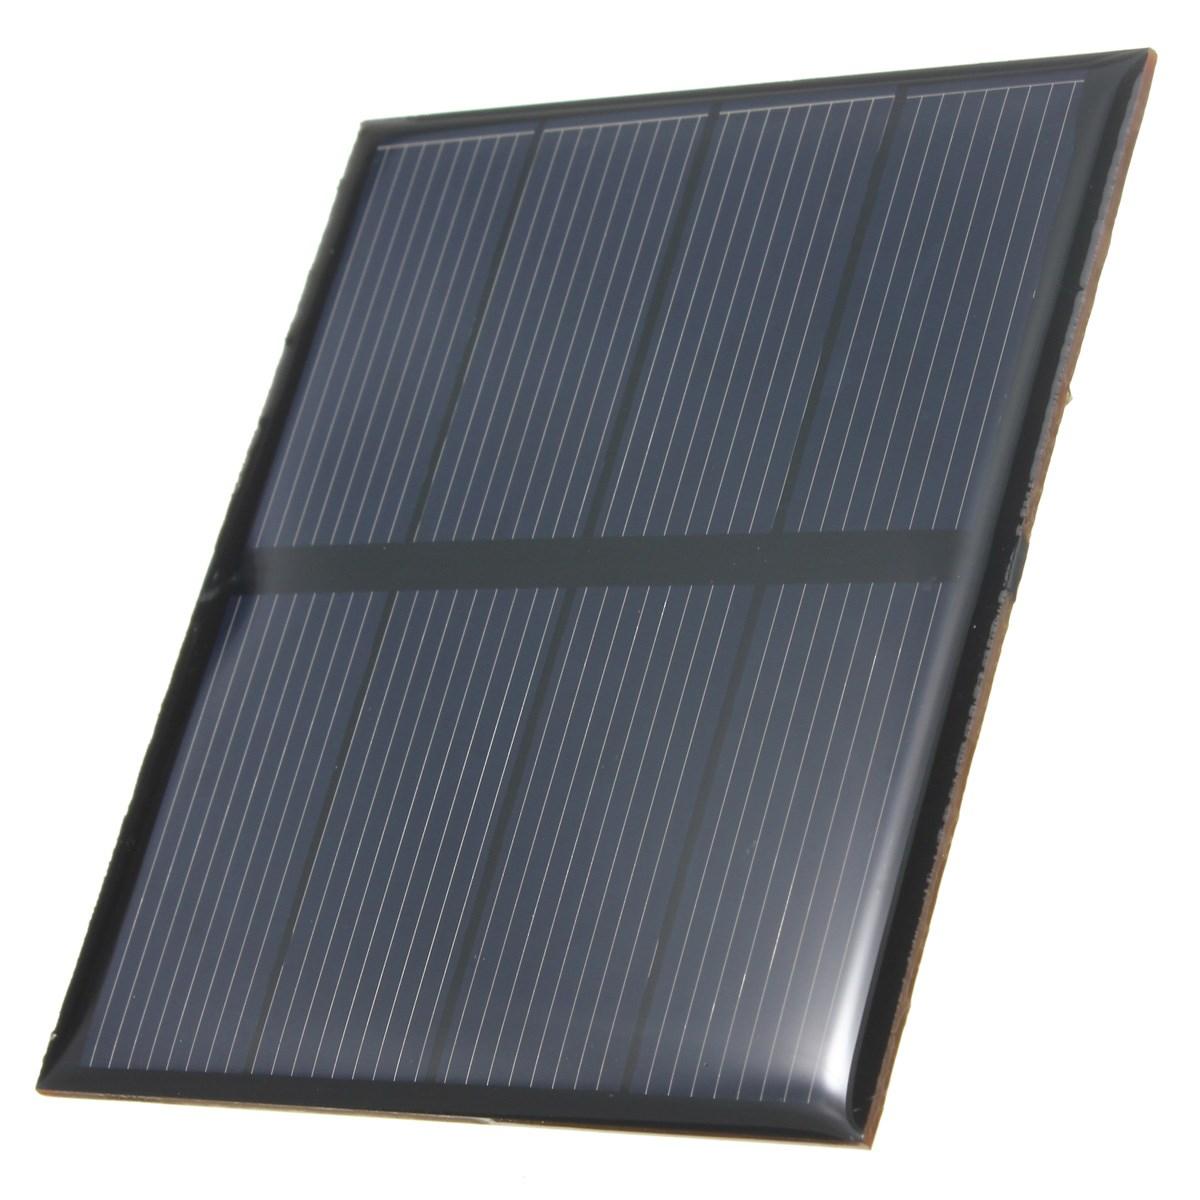 Hot Sale 2V 0.6W 300mAh Polycrystalline Silicon Epoxy Solar Panel Mini Solar Cells DIY Solar Module Stored Energy Power